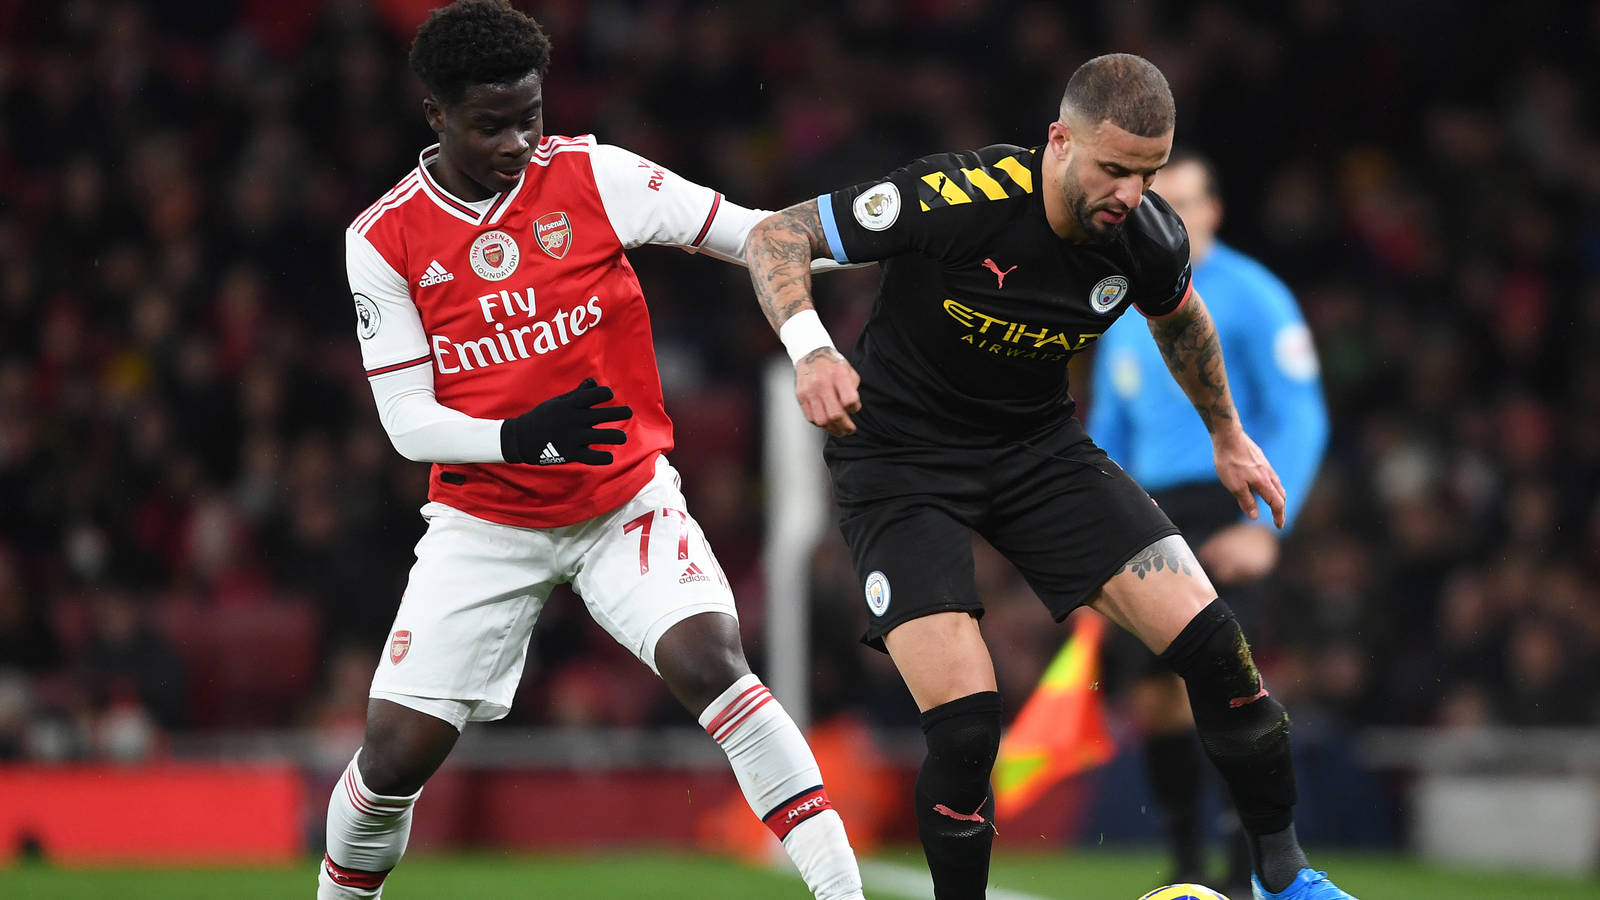 Premier League return Wednesday